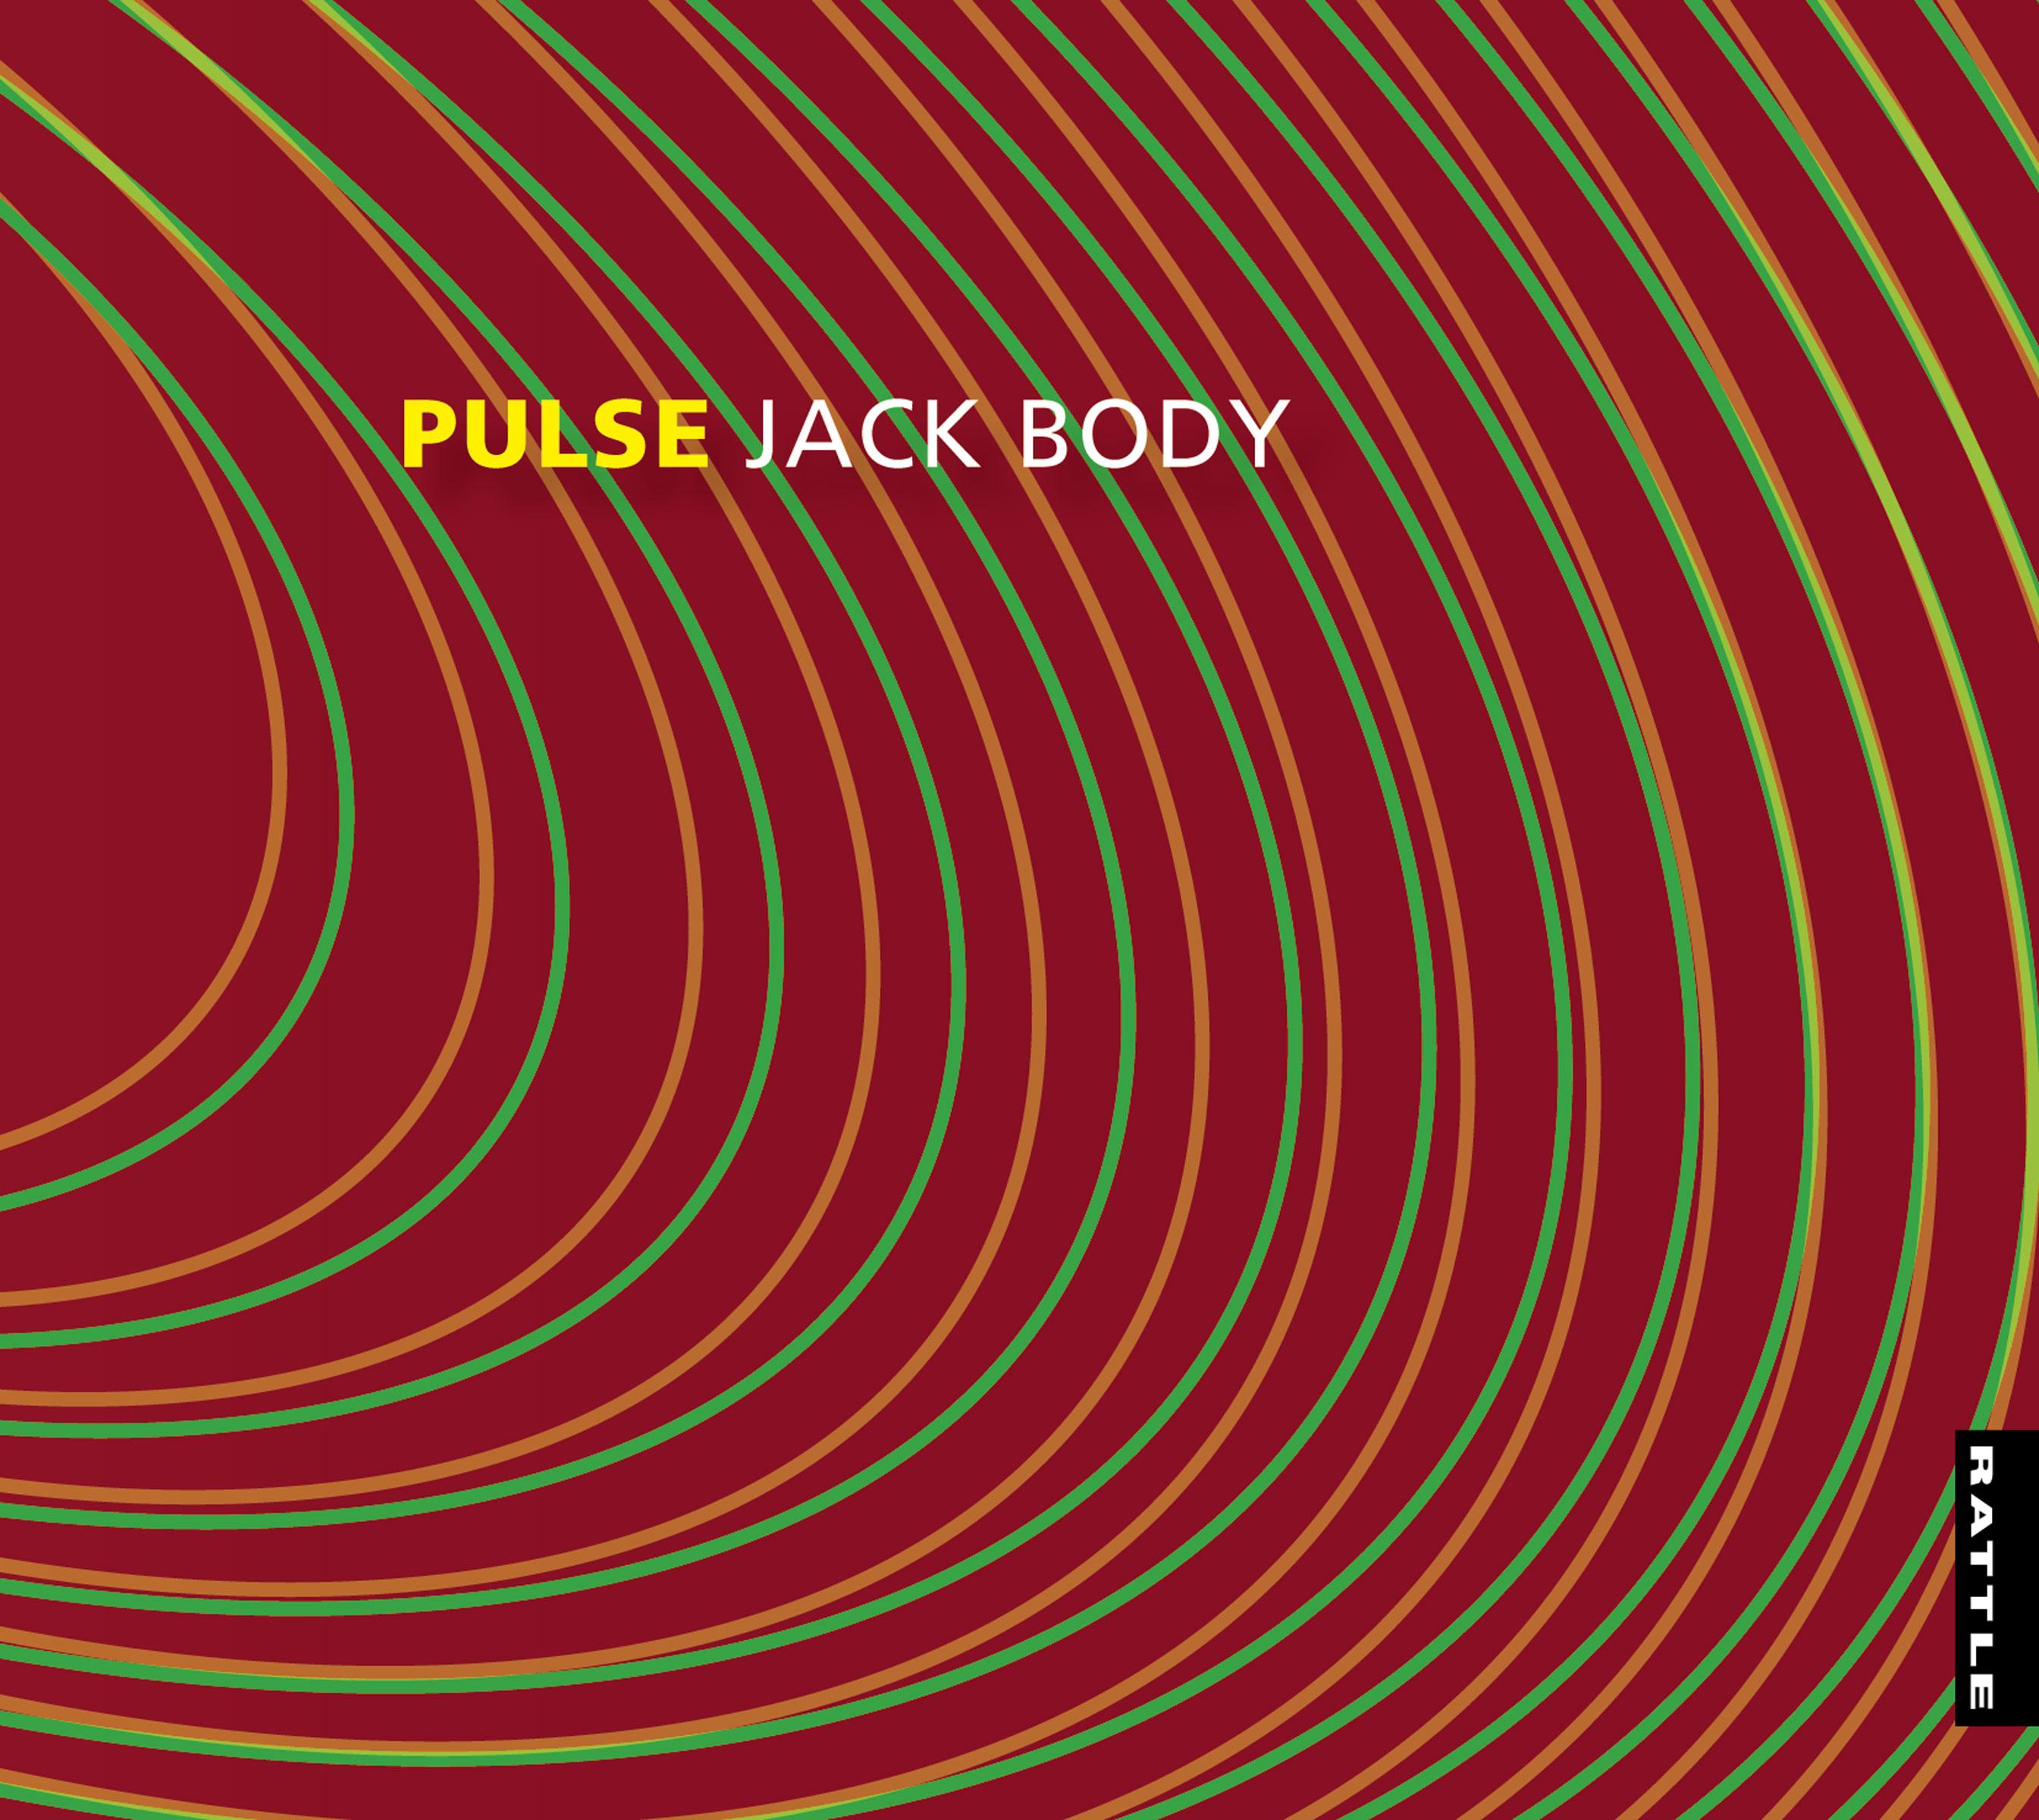 Jack Body | Pulse - downloadable MP3 ALBUM